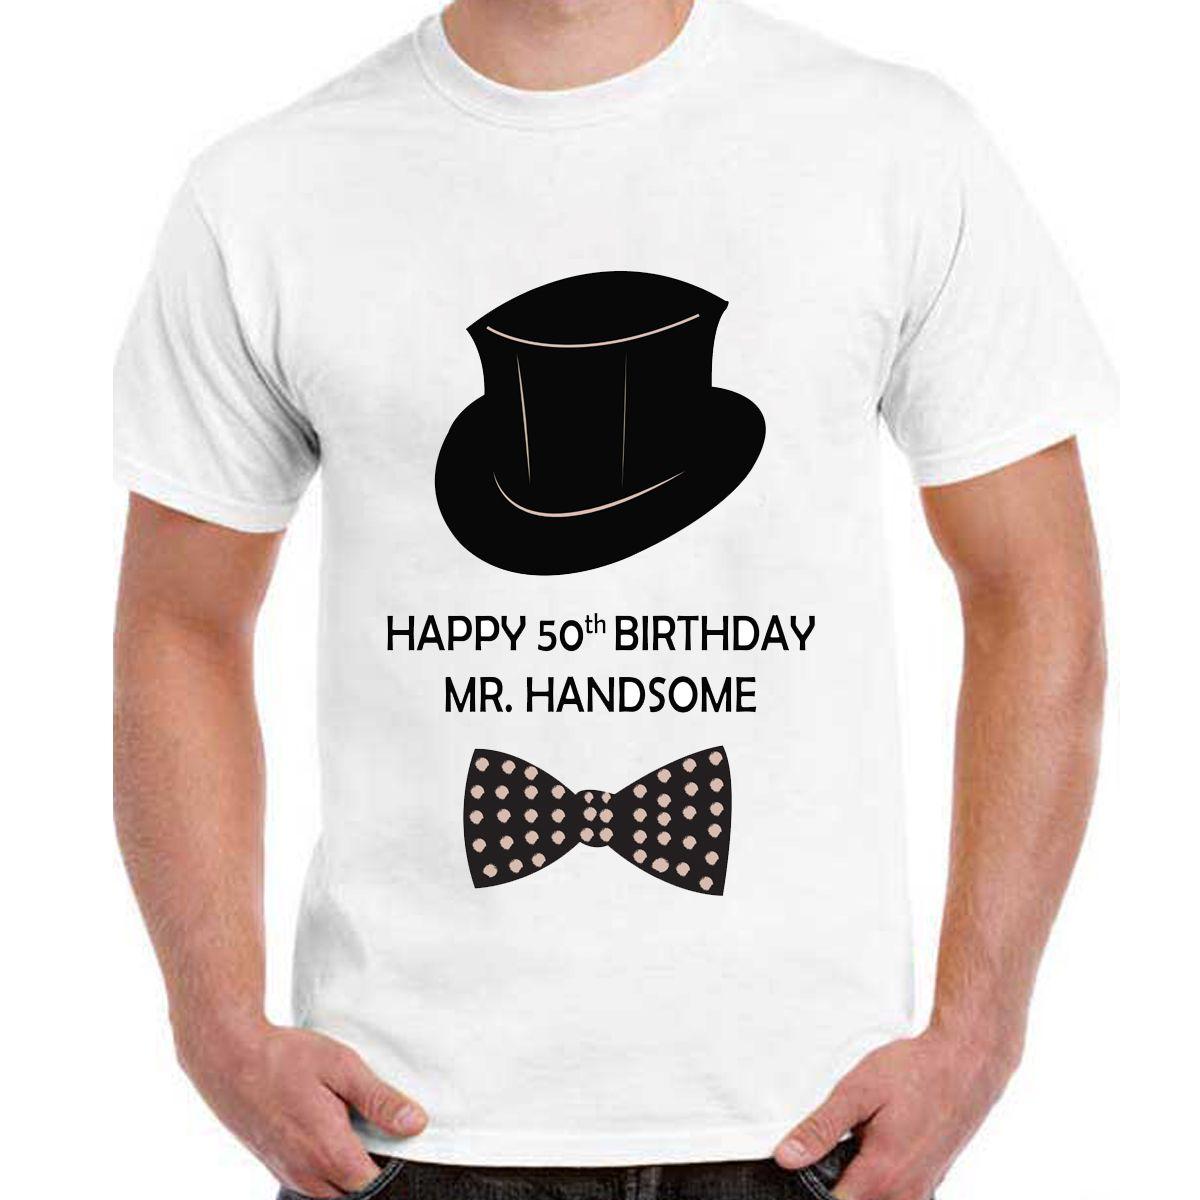 Tshirt on 50th Birthday